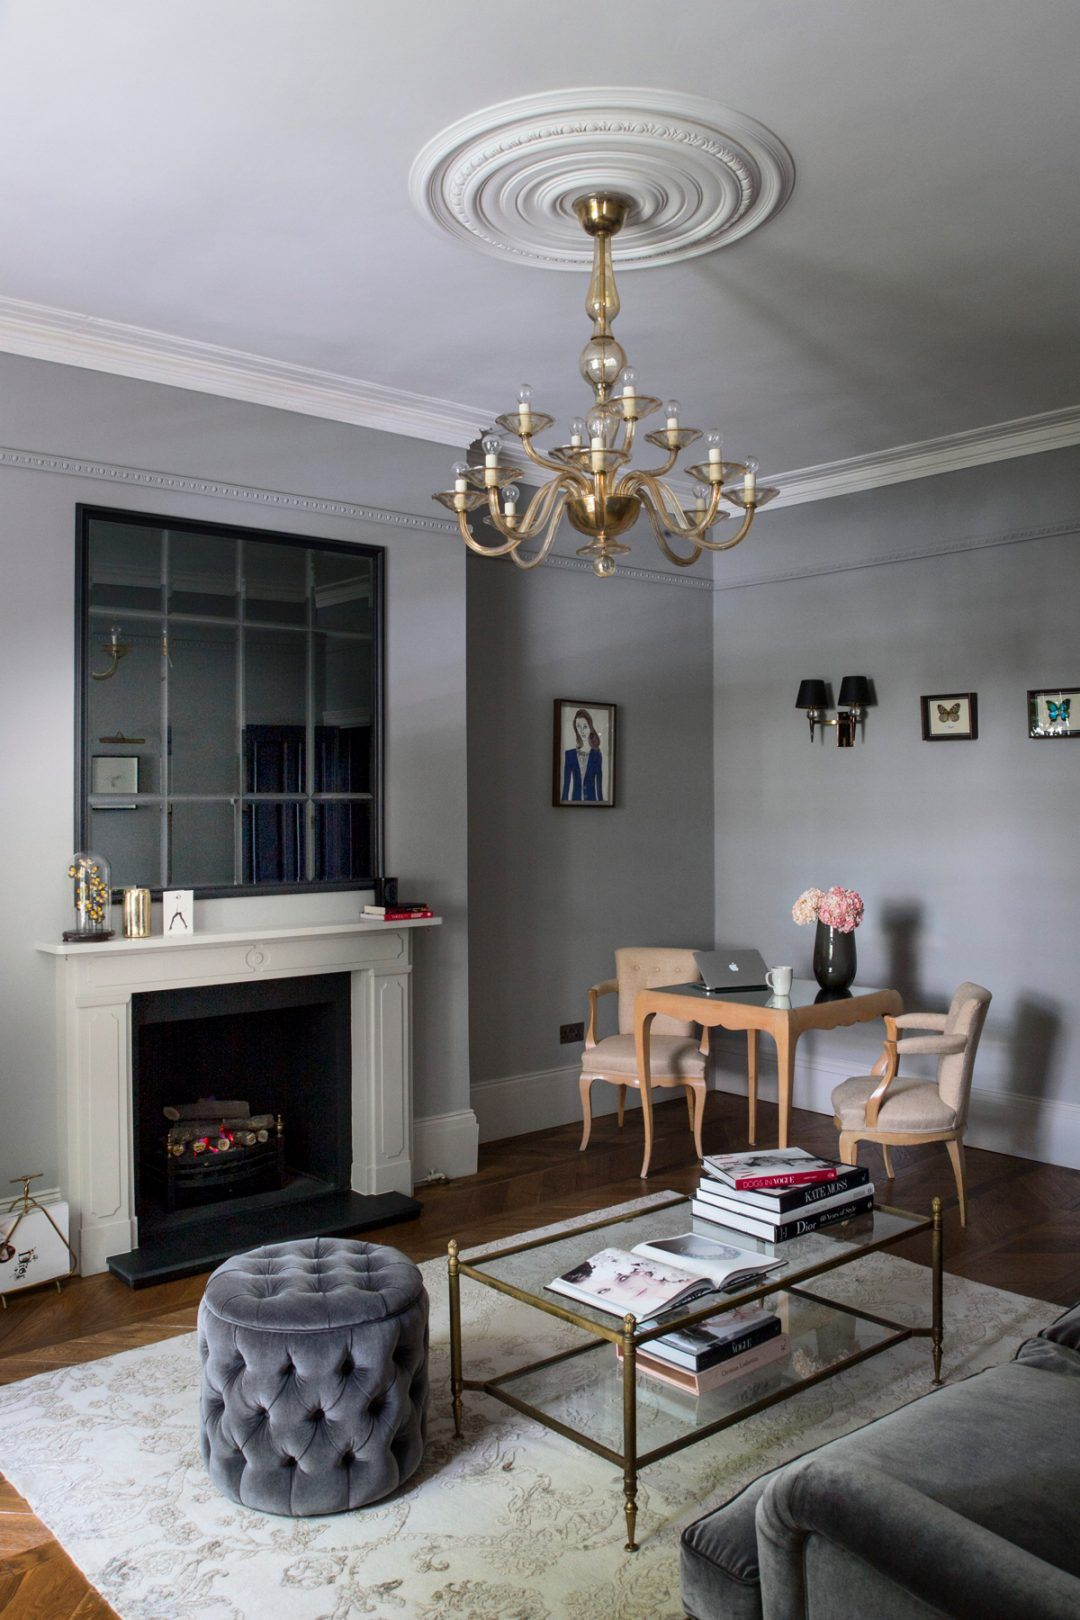 Tour a firstfloor apartment in a Victorian villa that